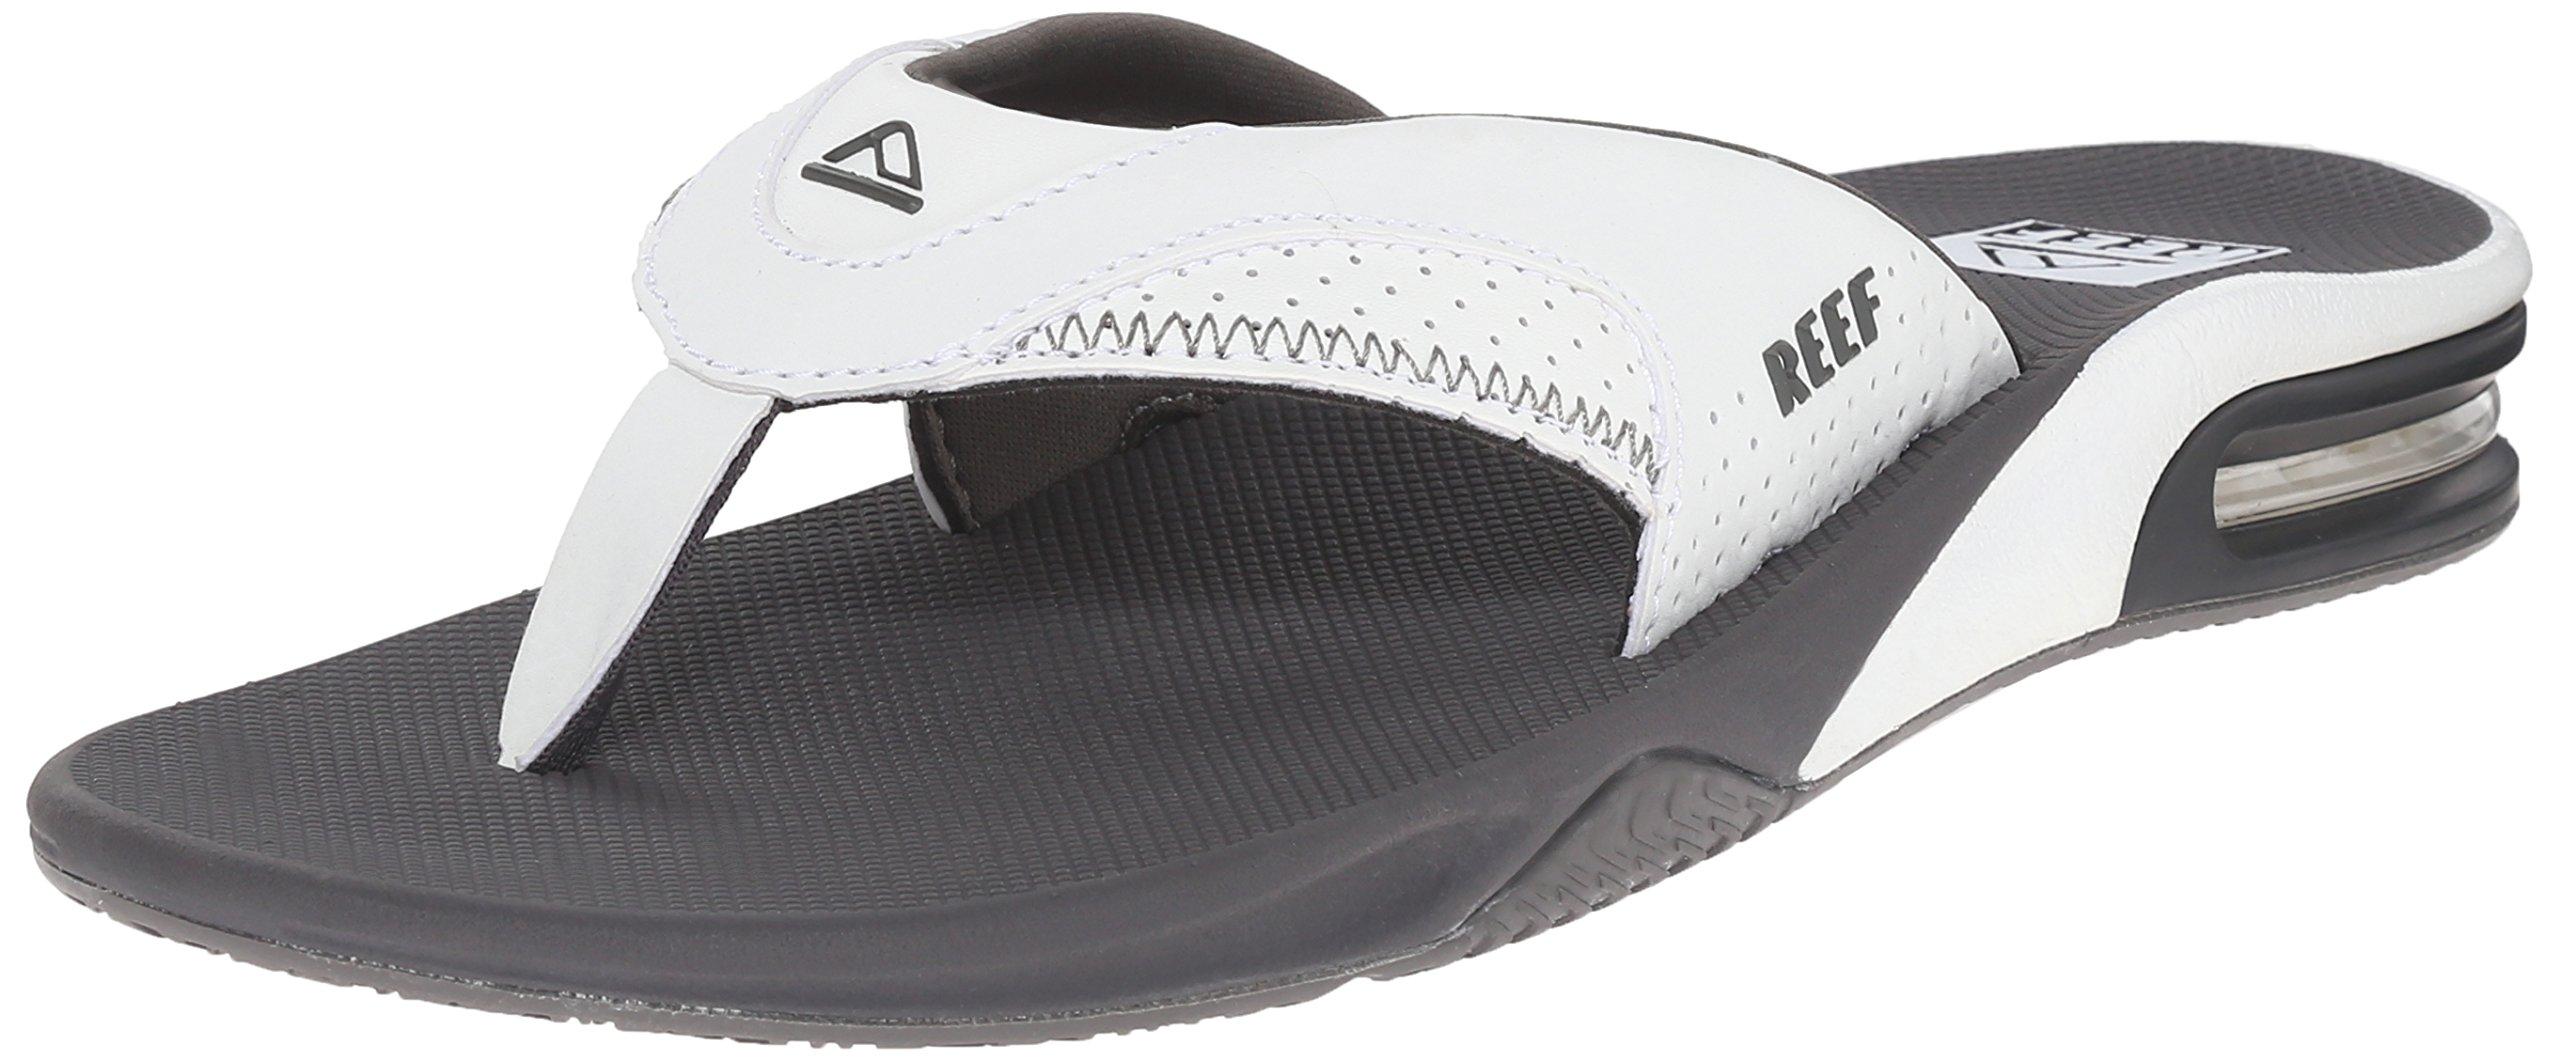 Reef Fanning Mens Sandals  Bottle Opener Flip Flops For Men,GREY/WHITE,7 M US